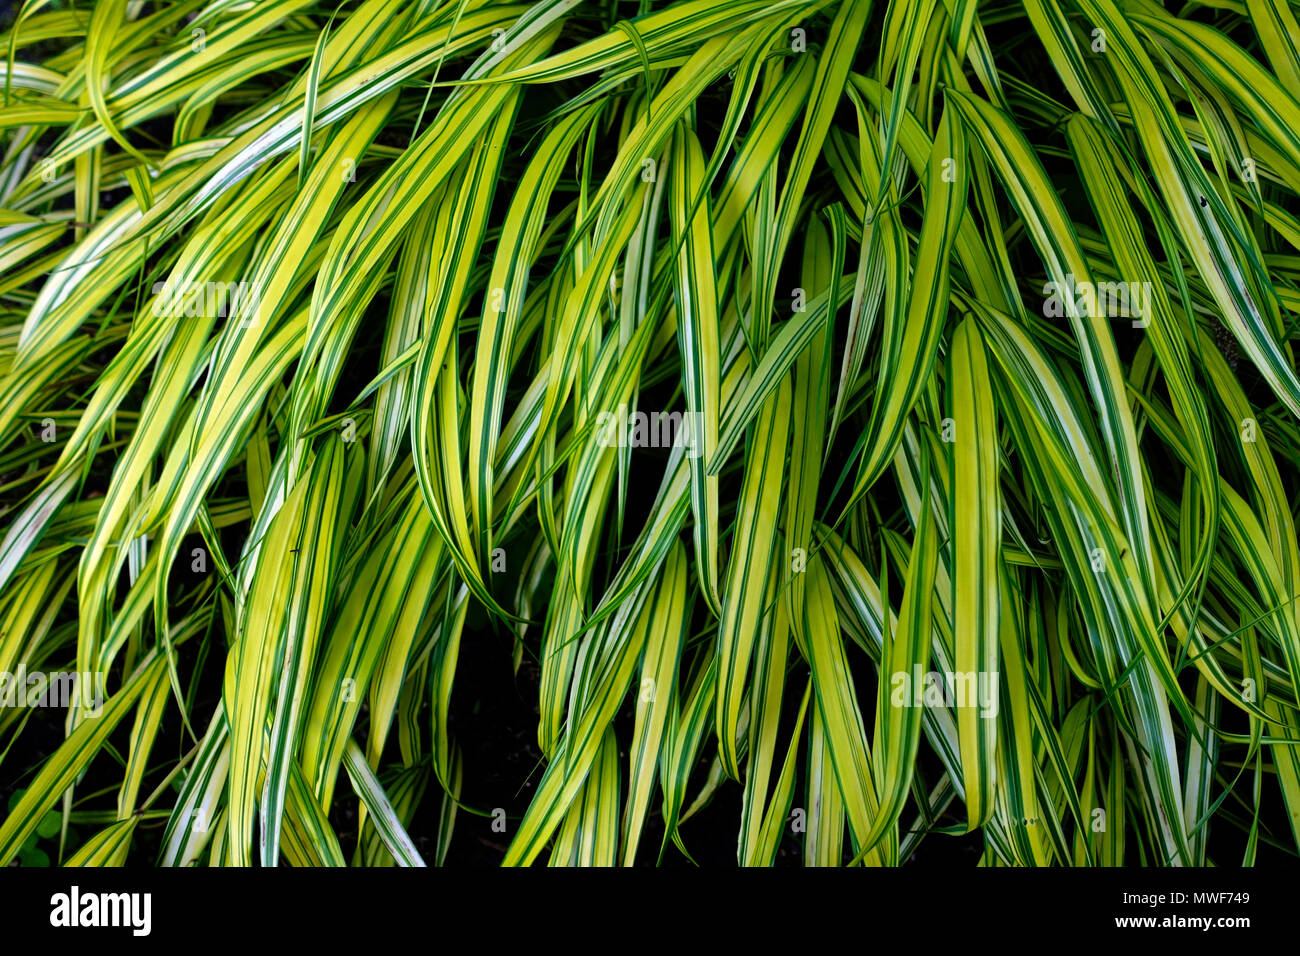 Hakonechloa macra 'Aureola', Hakone Gras oder Japanischen Wald Gras Stockbild